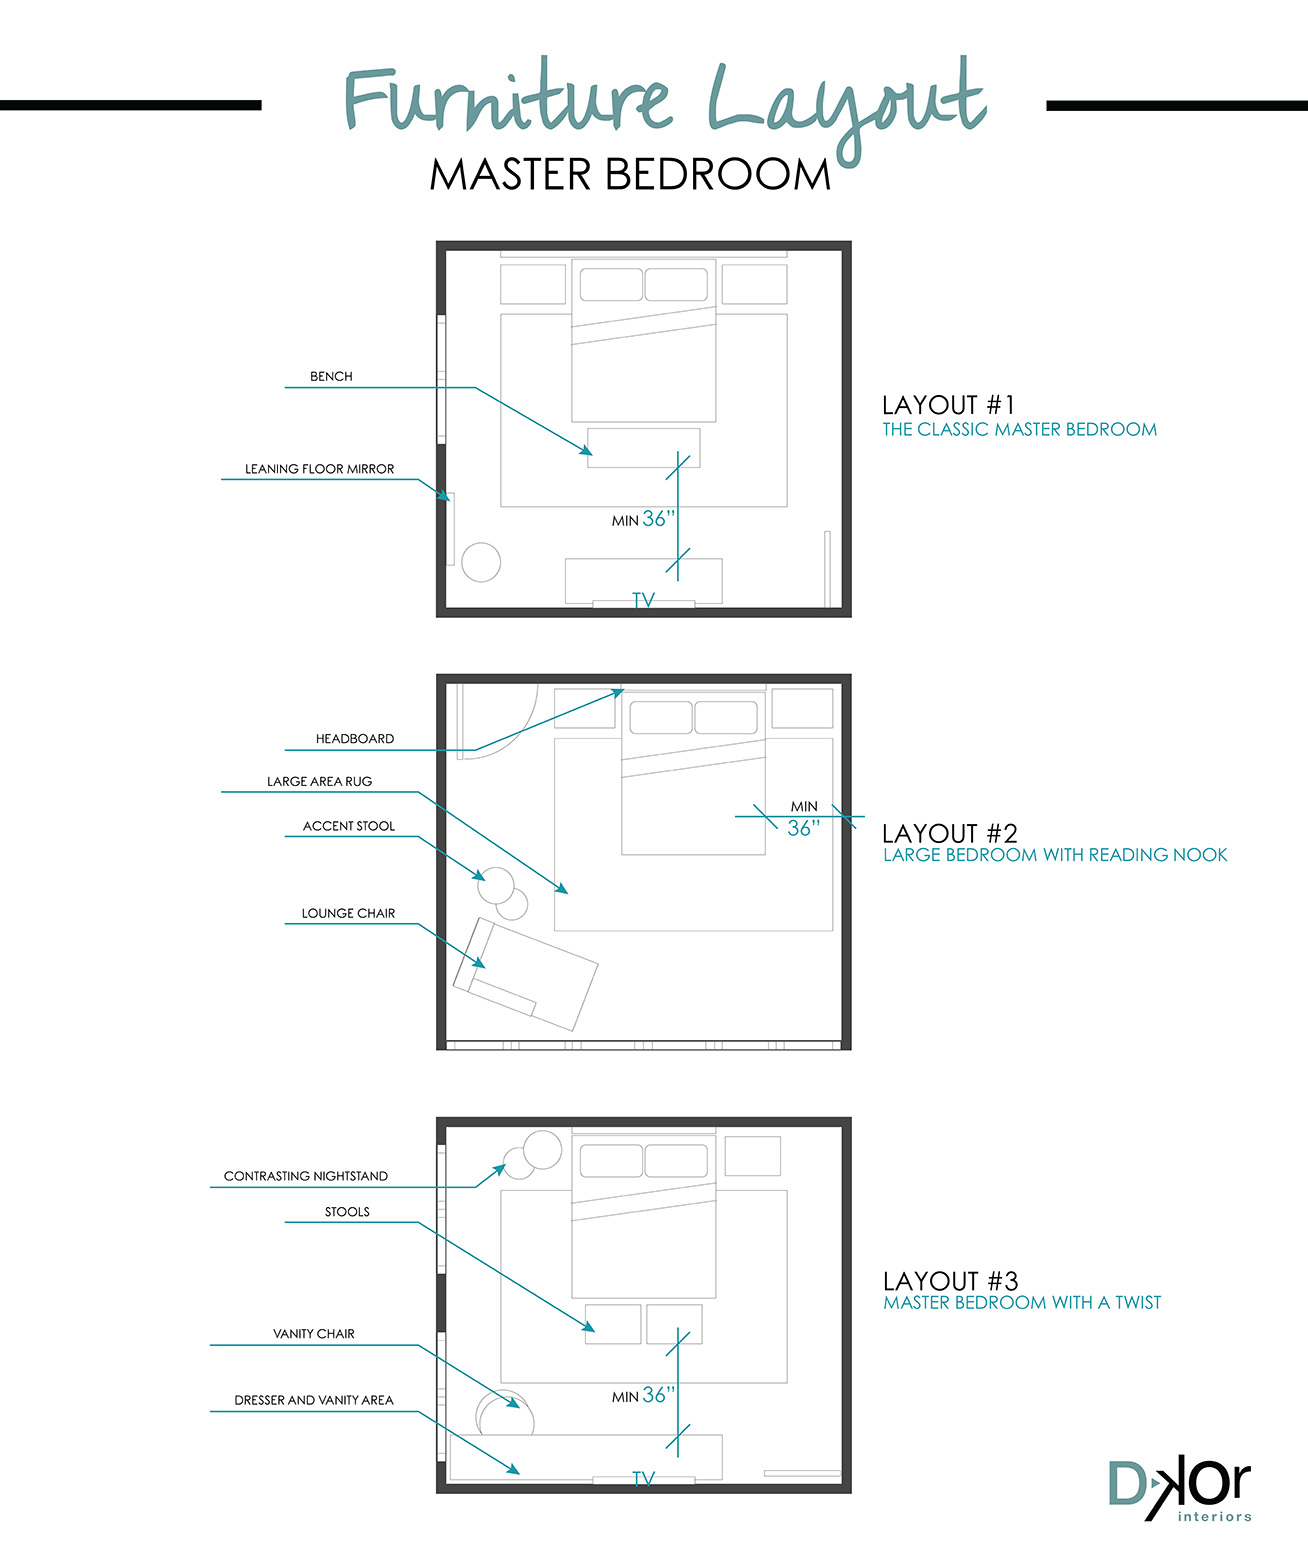 Bedroom Layout Ideas Furniture Placement Bedroom Design Master Bedroom Layo Bedroom Furniture Placement Master Bedroom Furniture Layout Bedroom Arrangement